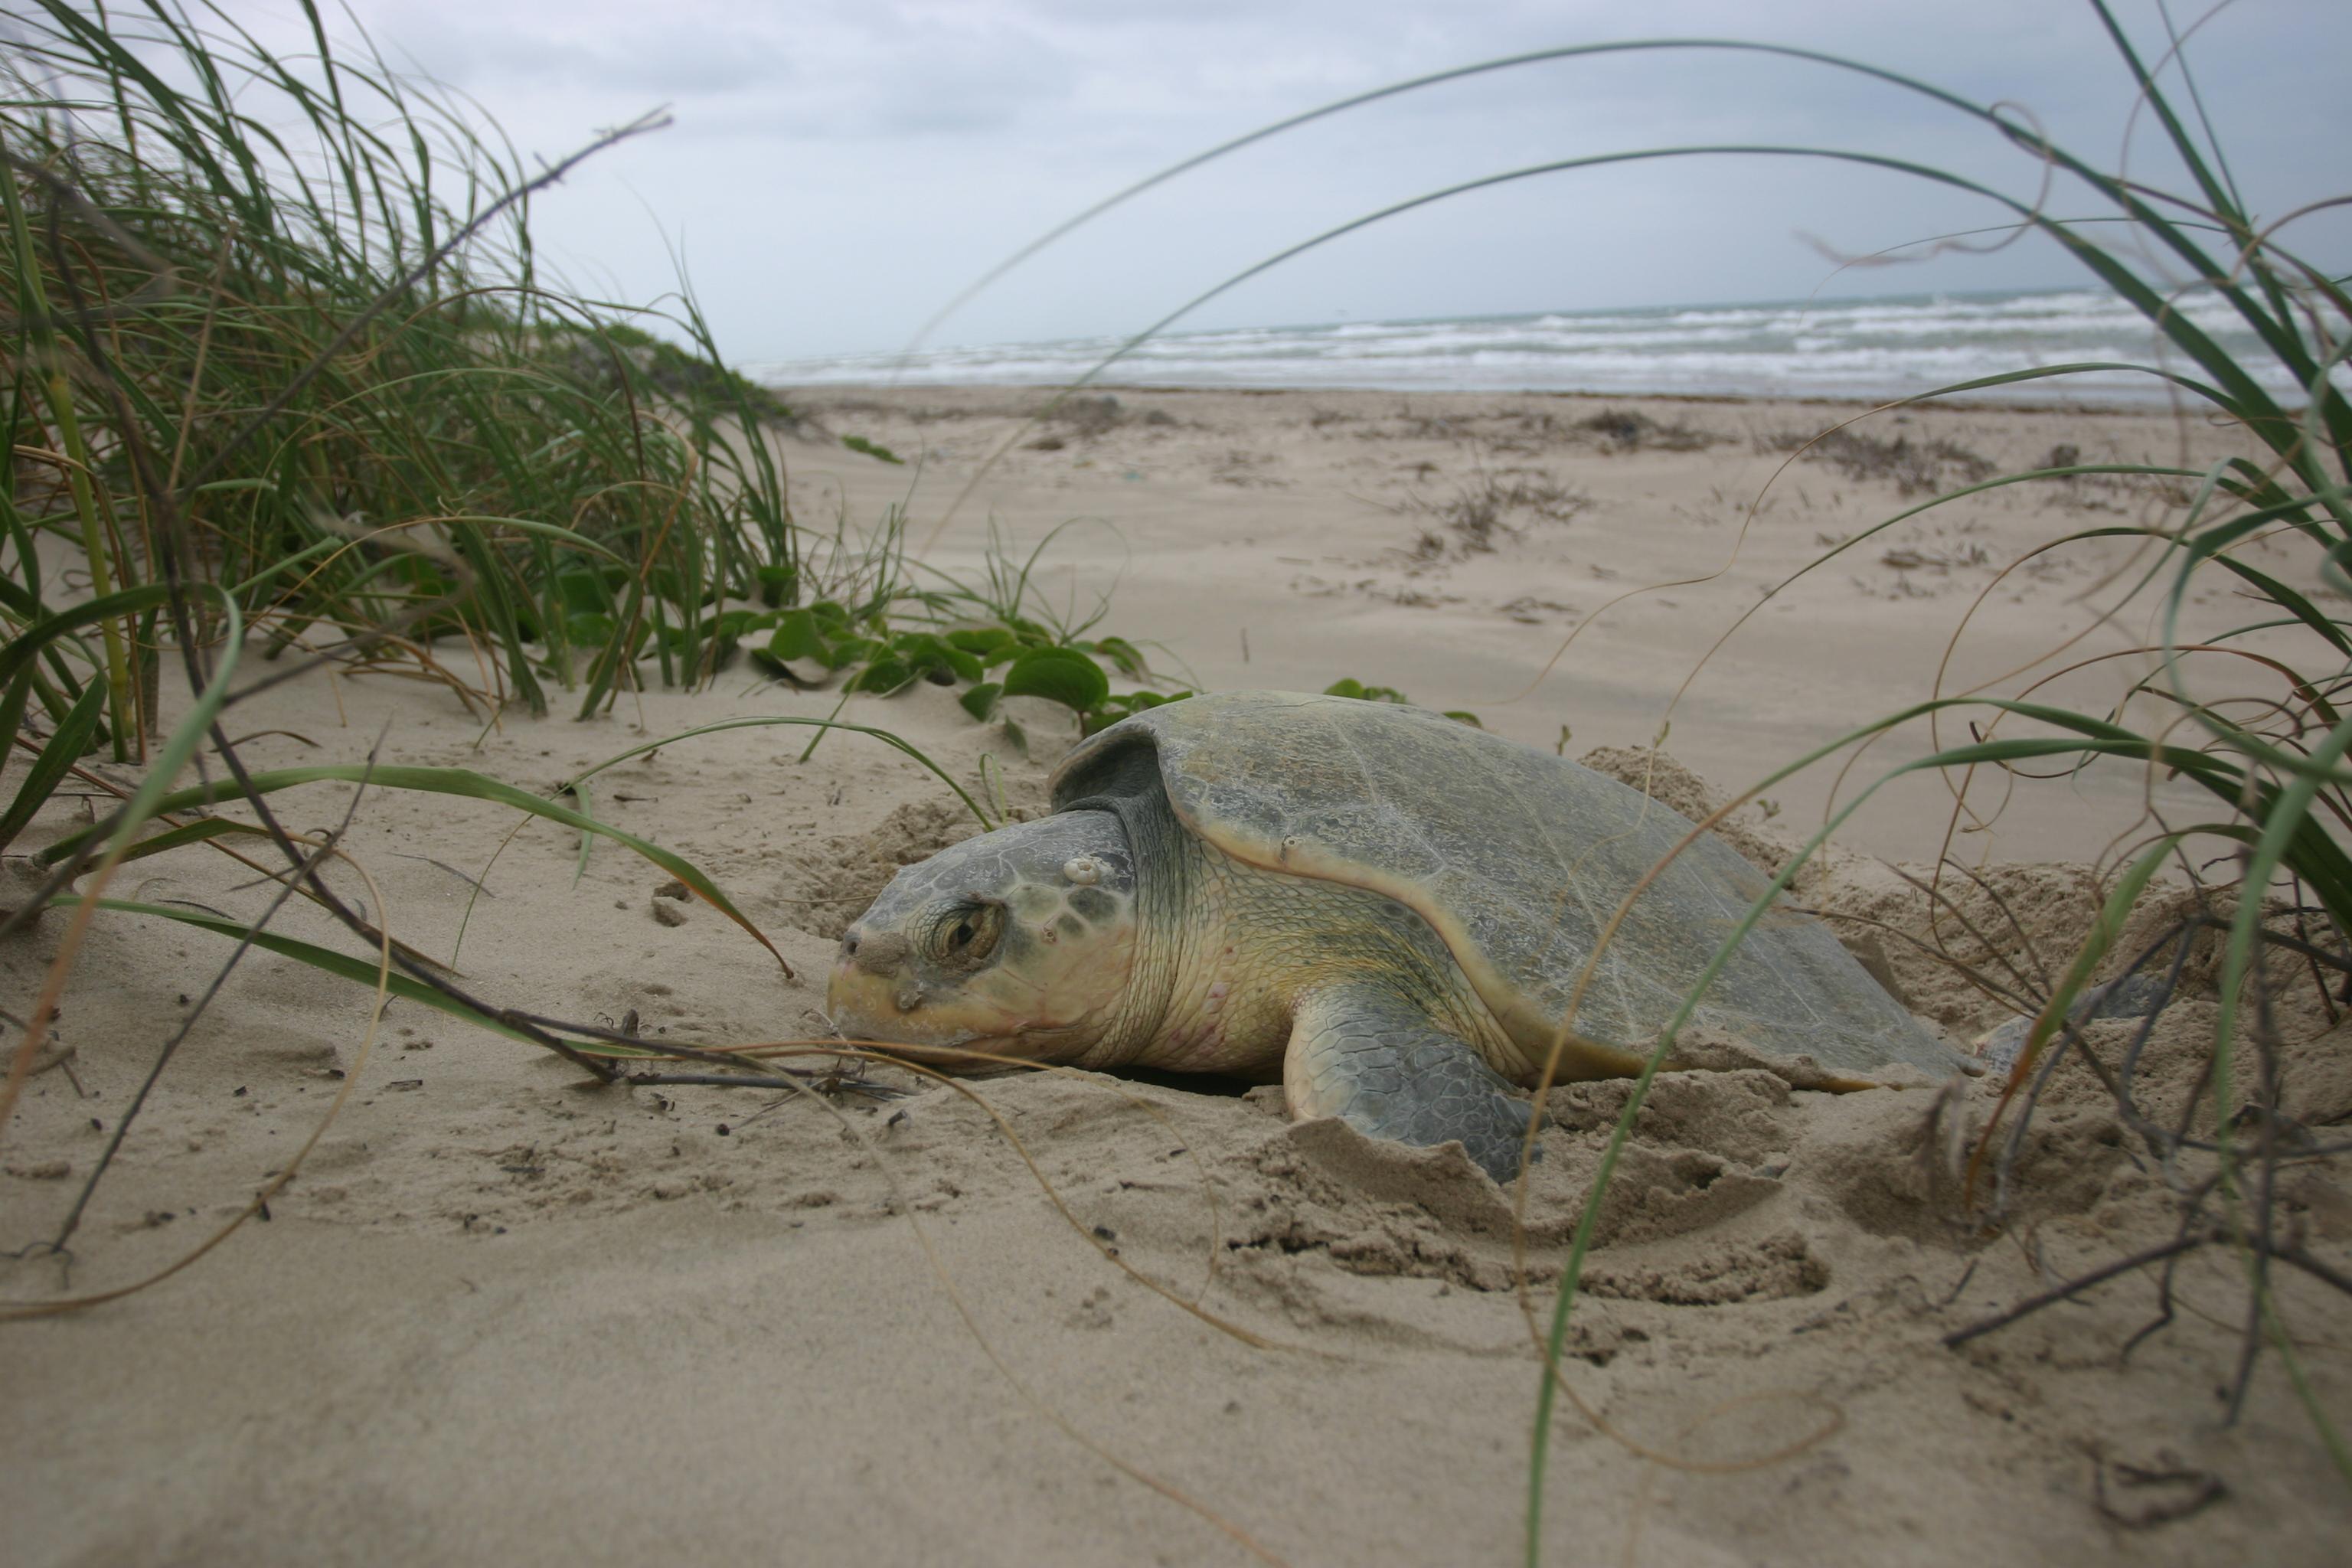 Sea Turtles in Texas Kemp's Ridley Sea Turtles